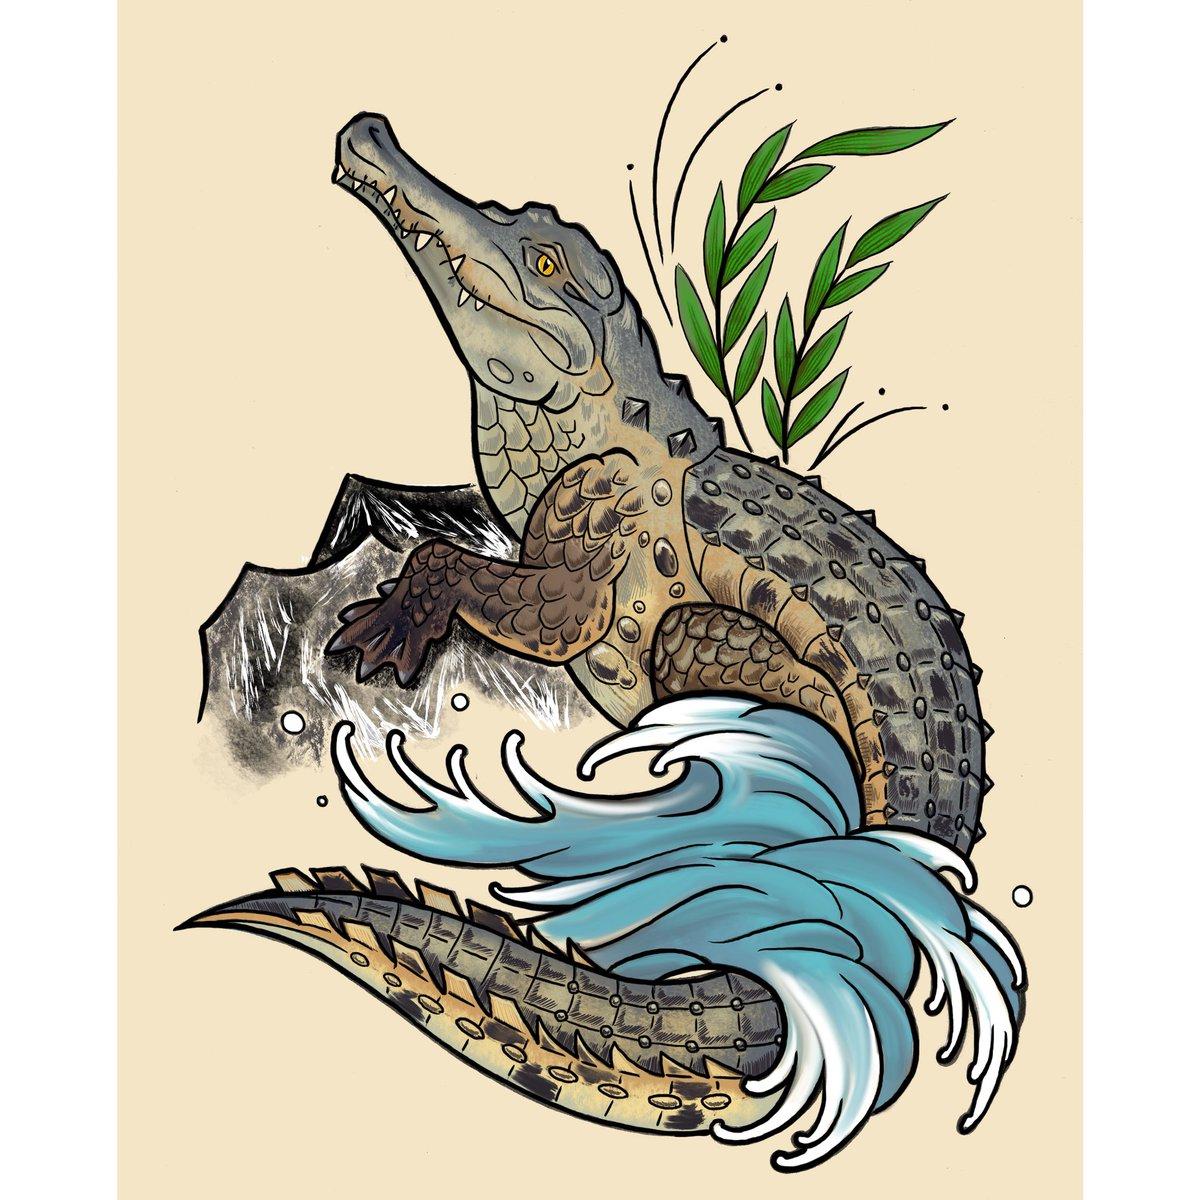 painting of an orinoco crocodile, full body profile facing left